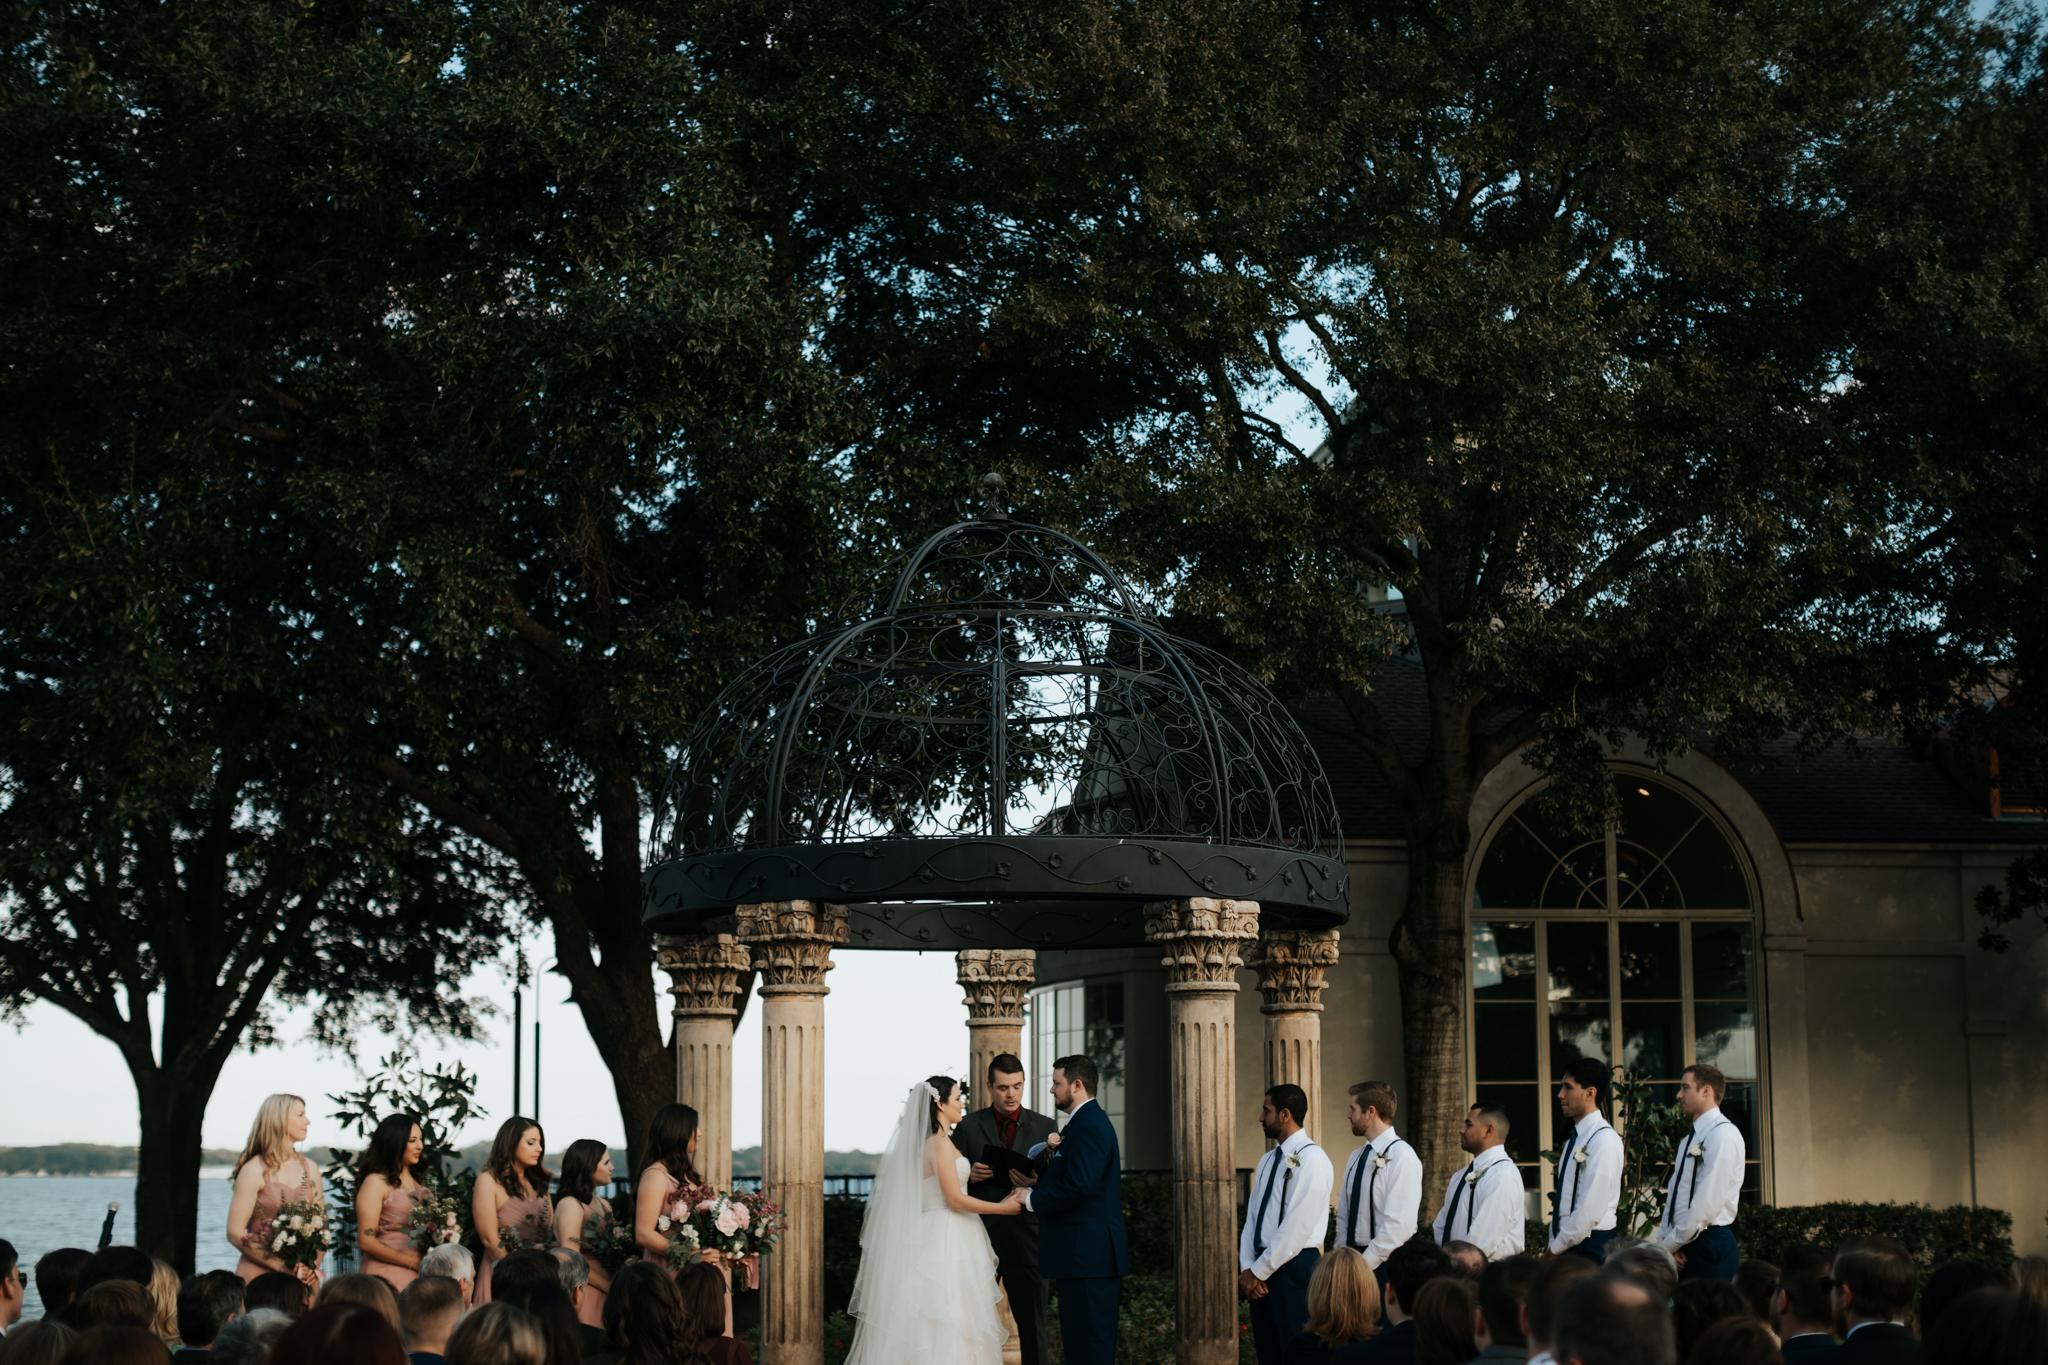 Leah Nicole Photography - Houston Wedding Photographer-Lake Conroe Wedding- Houston Wedding Photographer-33.jpg